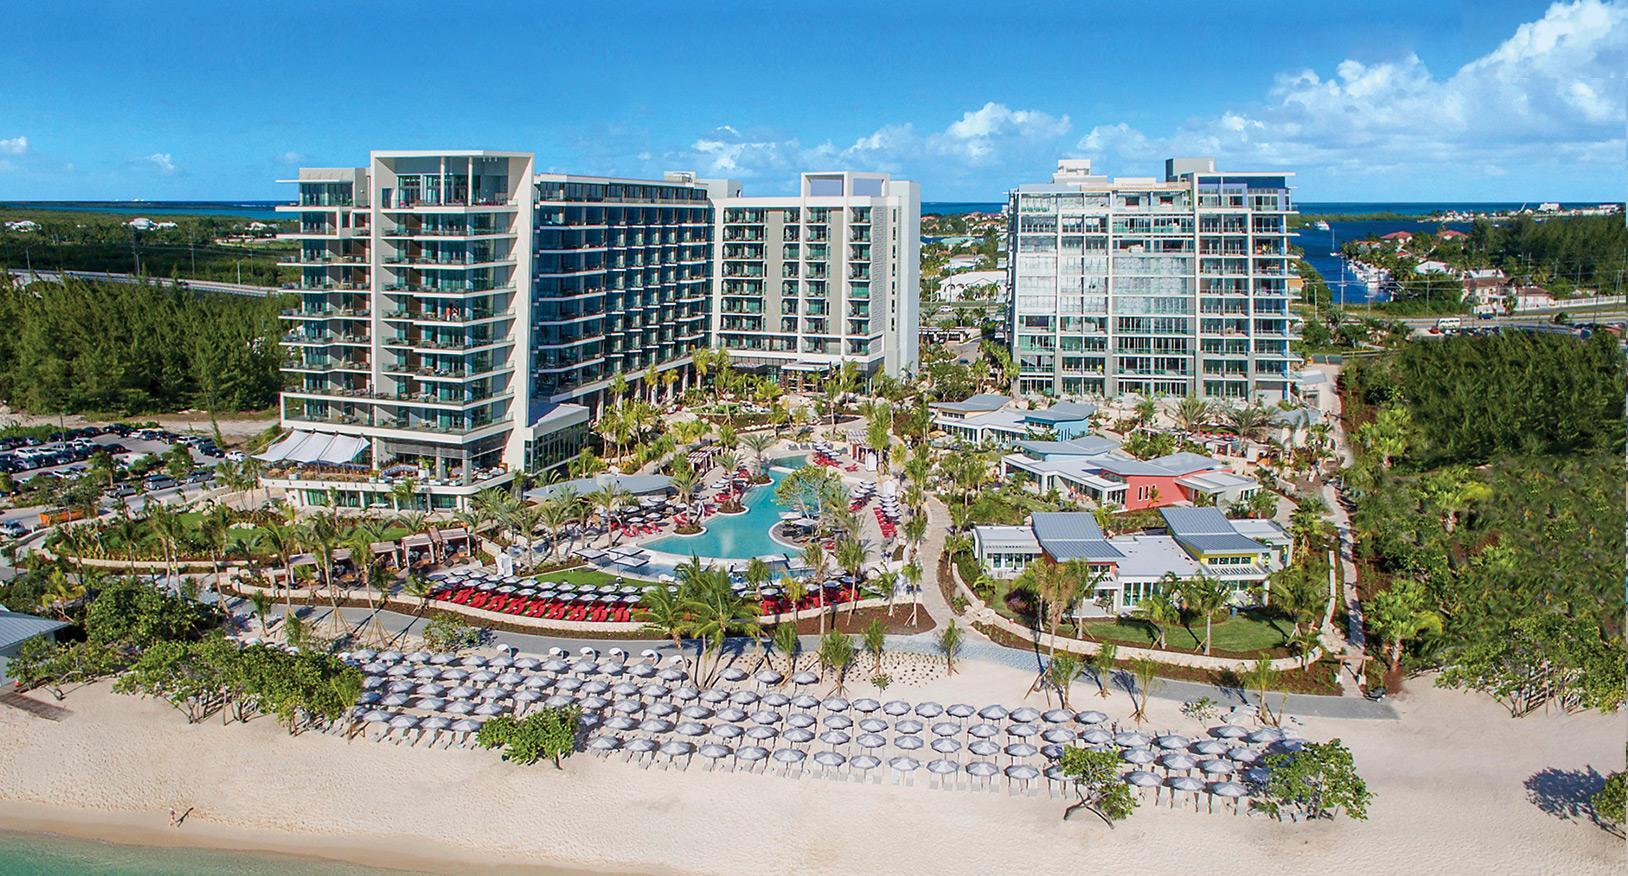 Incentive Travel Spotlight: Kimpton Seafire Resort & Spa, Grand Cayman